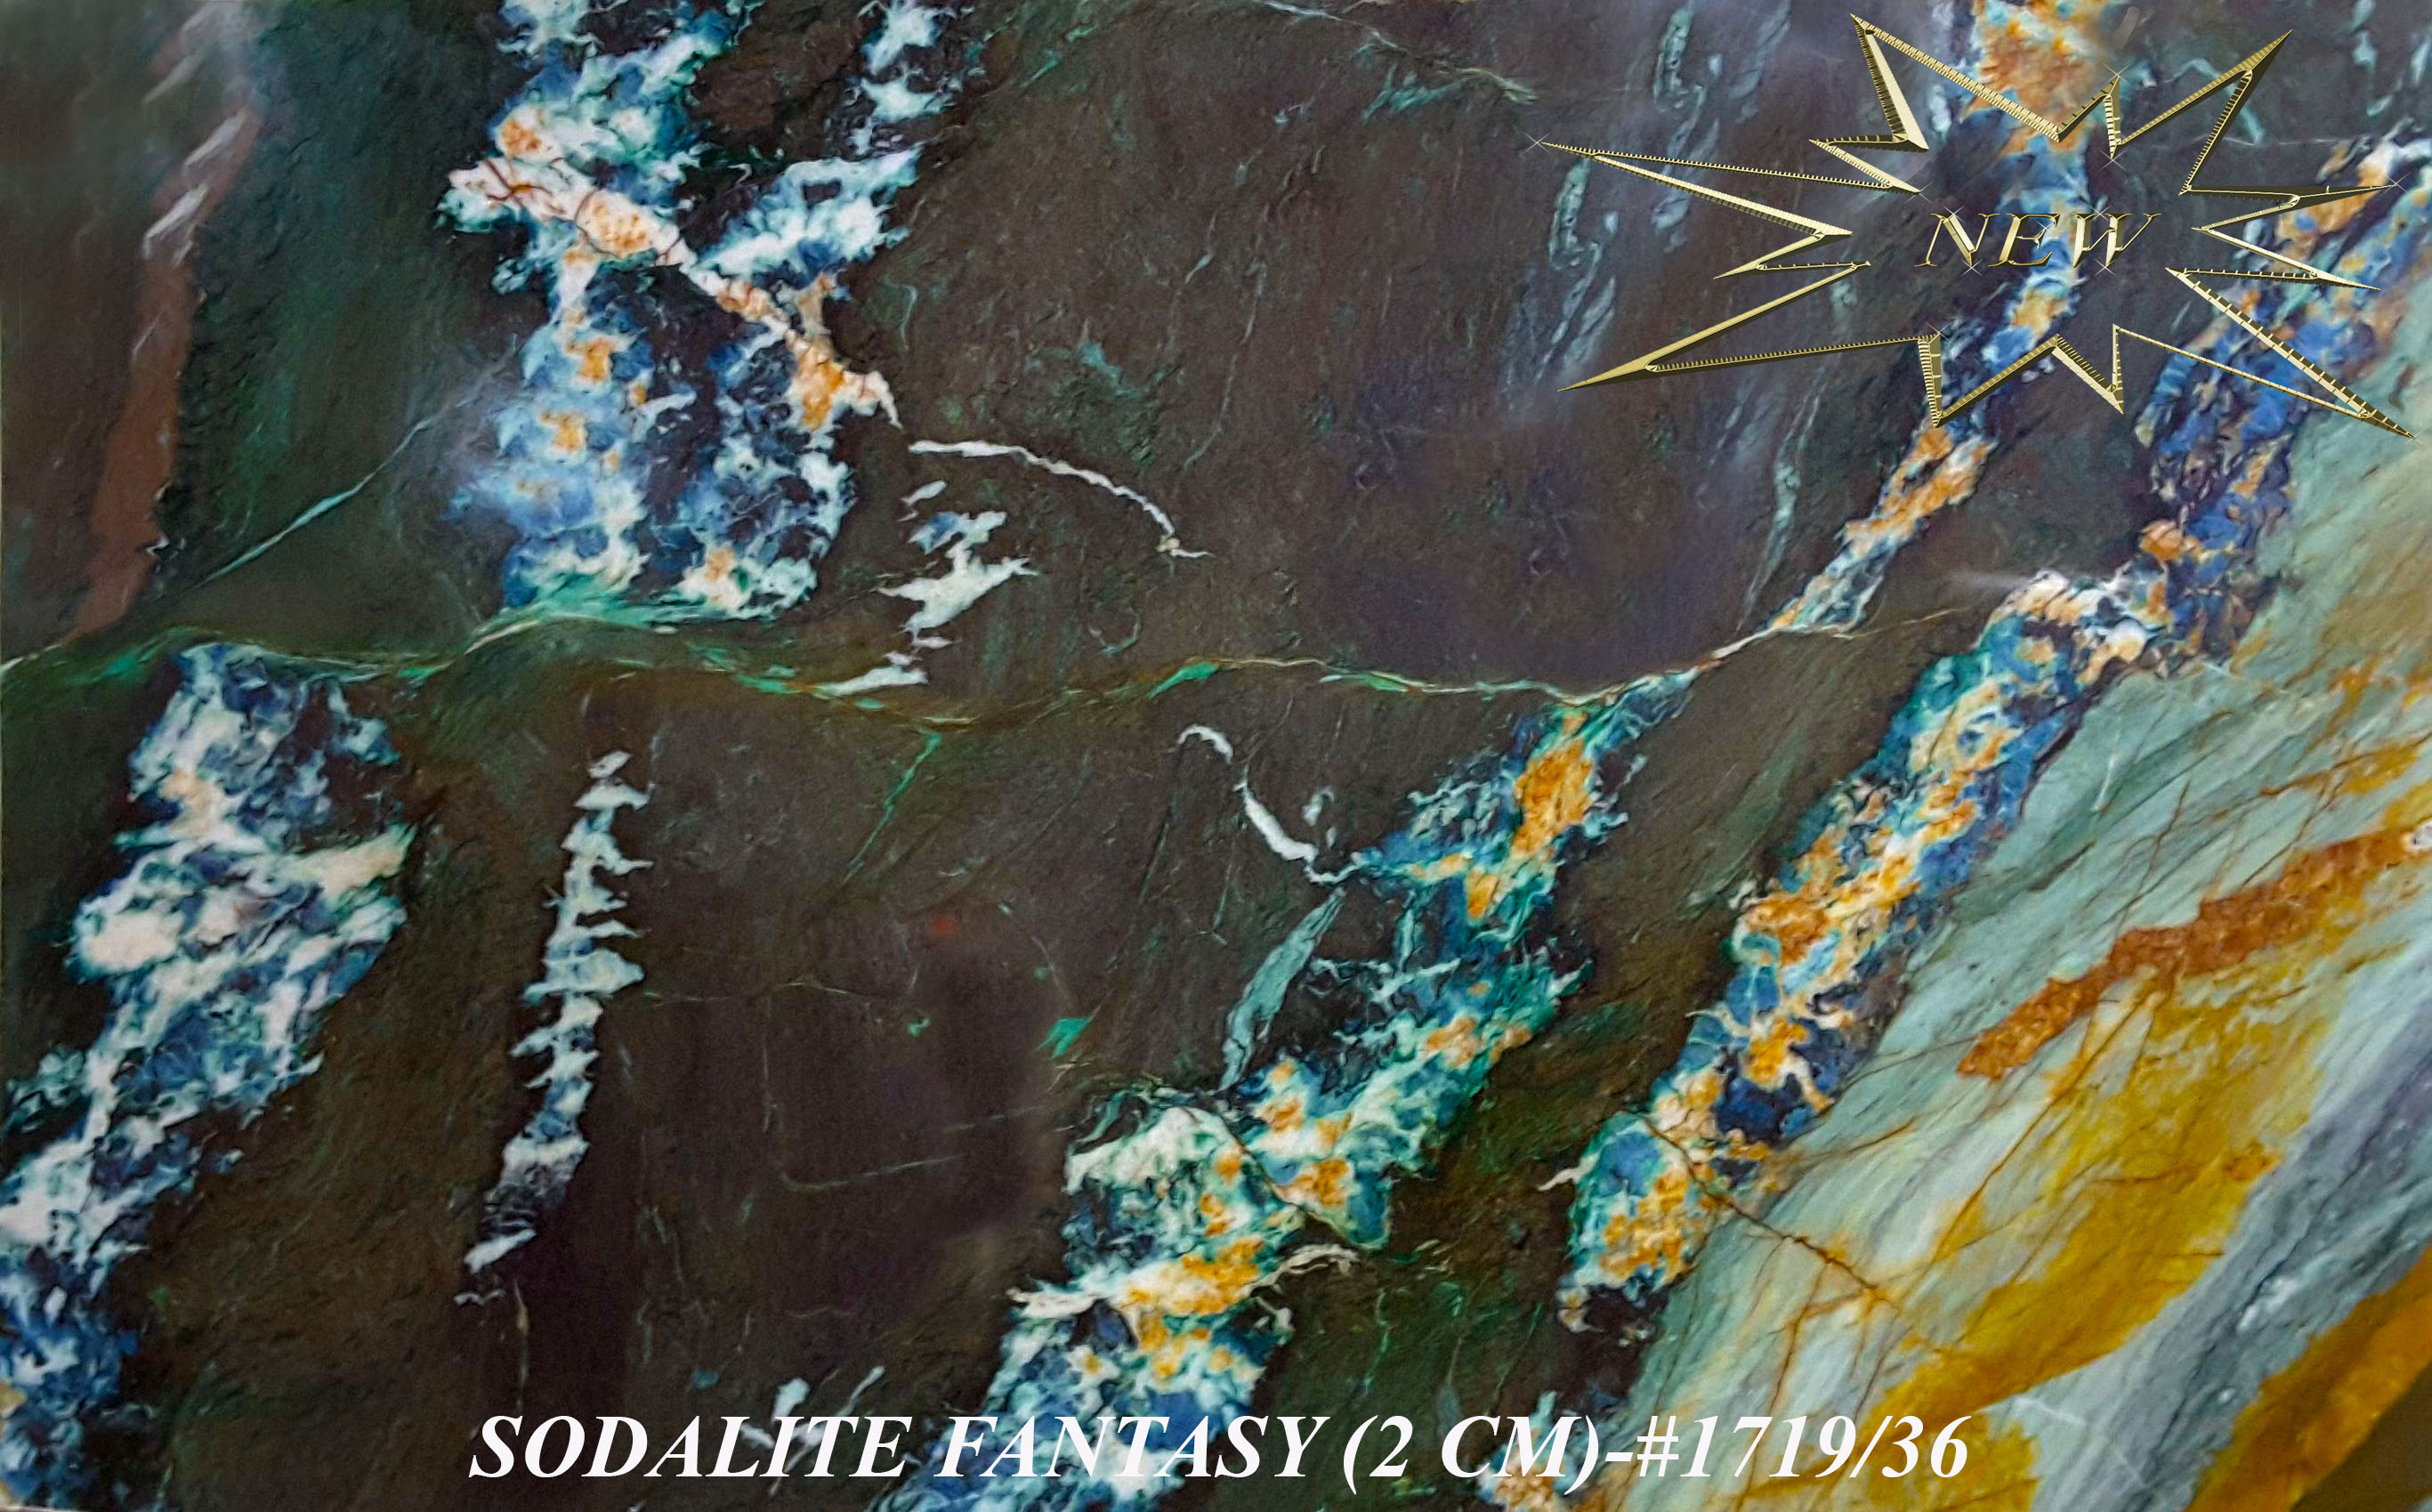 SODALITE FANTASY 2CM-#1719-36-STAR